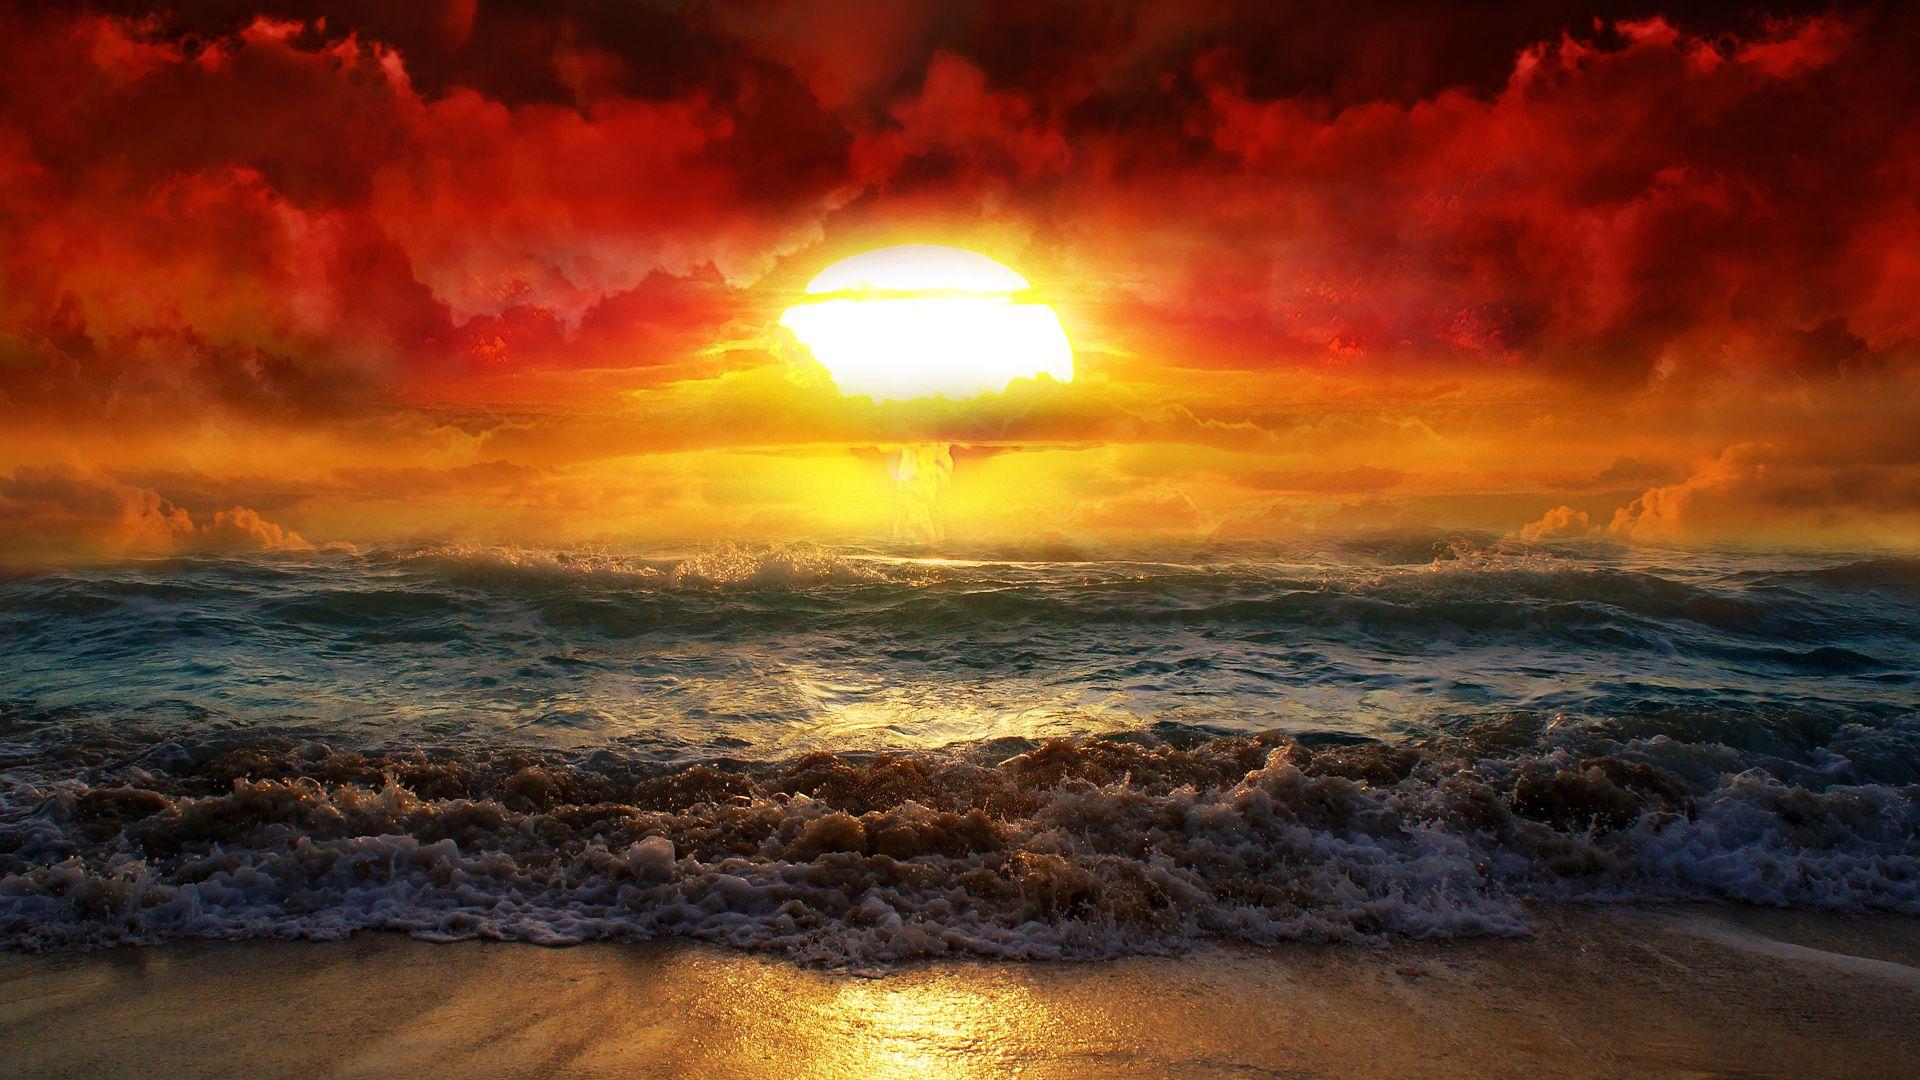 Abstract Golden Sunrise Wallpaper Desktop Wallpapers Hd Beautiful Sunrise Beautiful Sunset Nature Photography